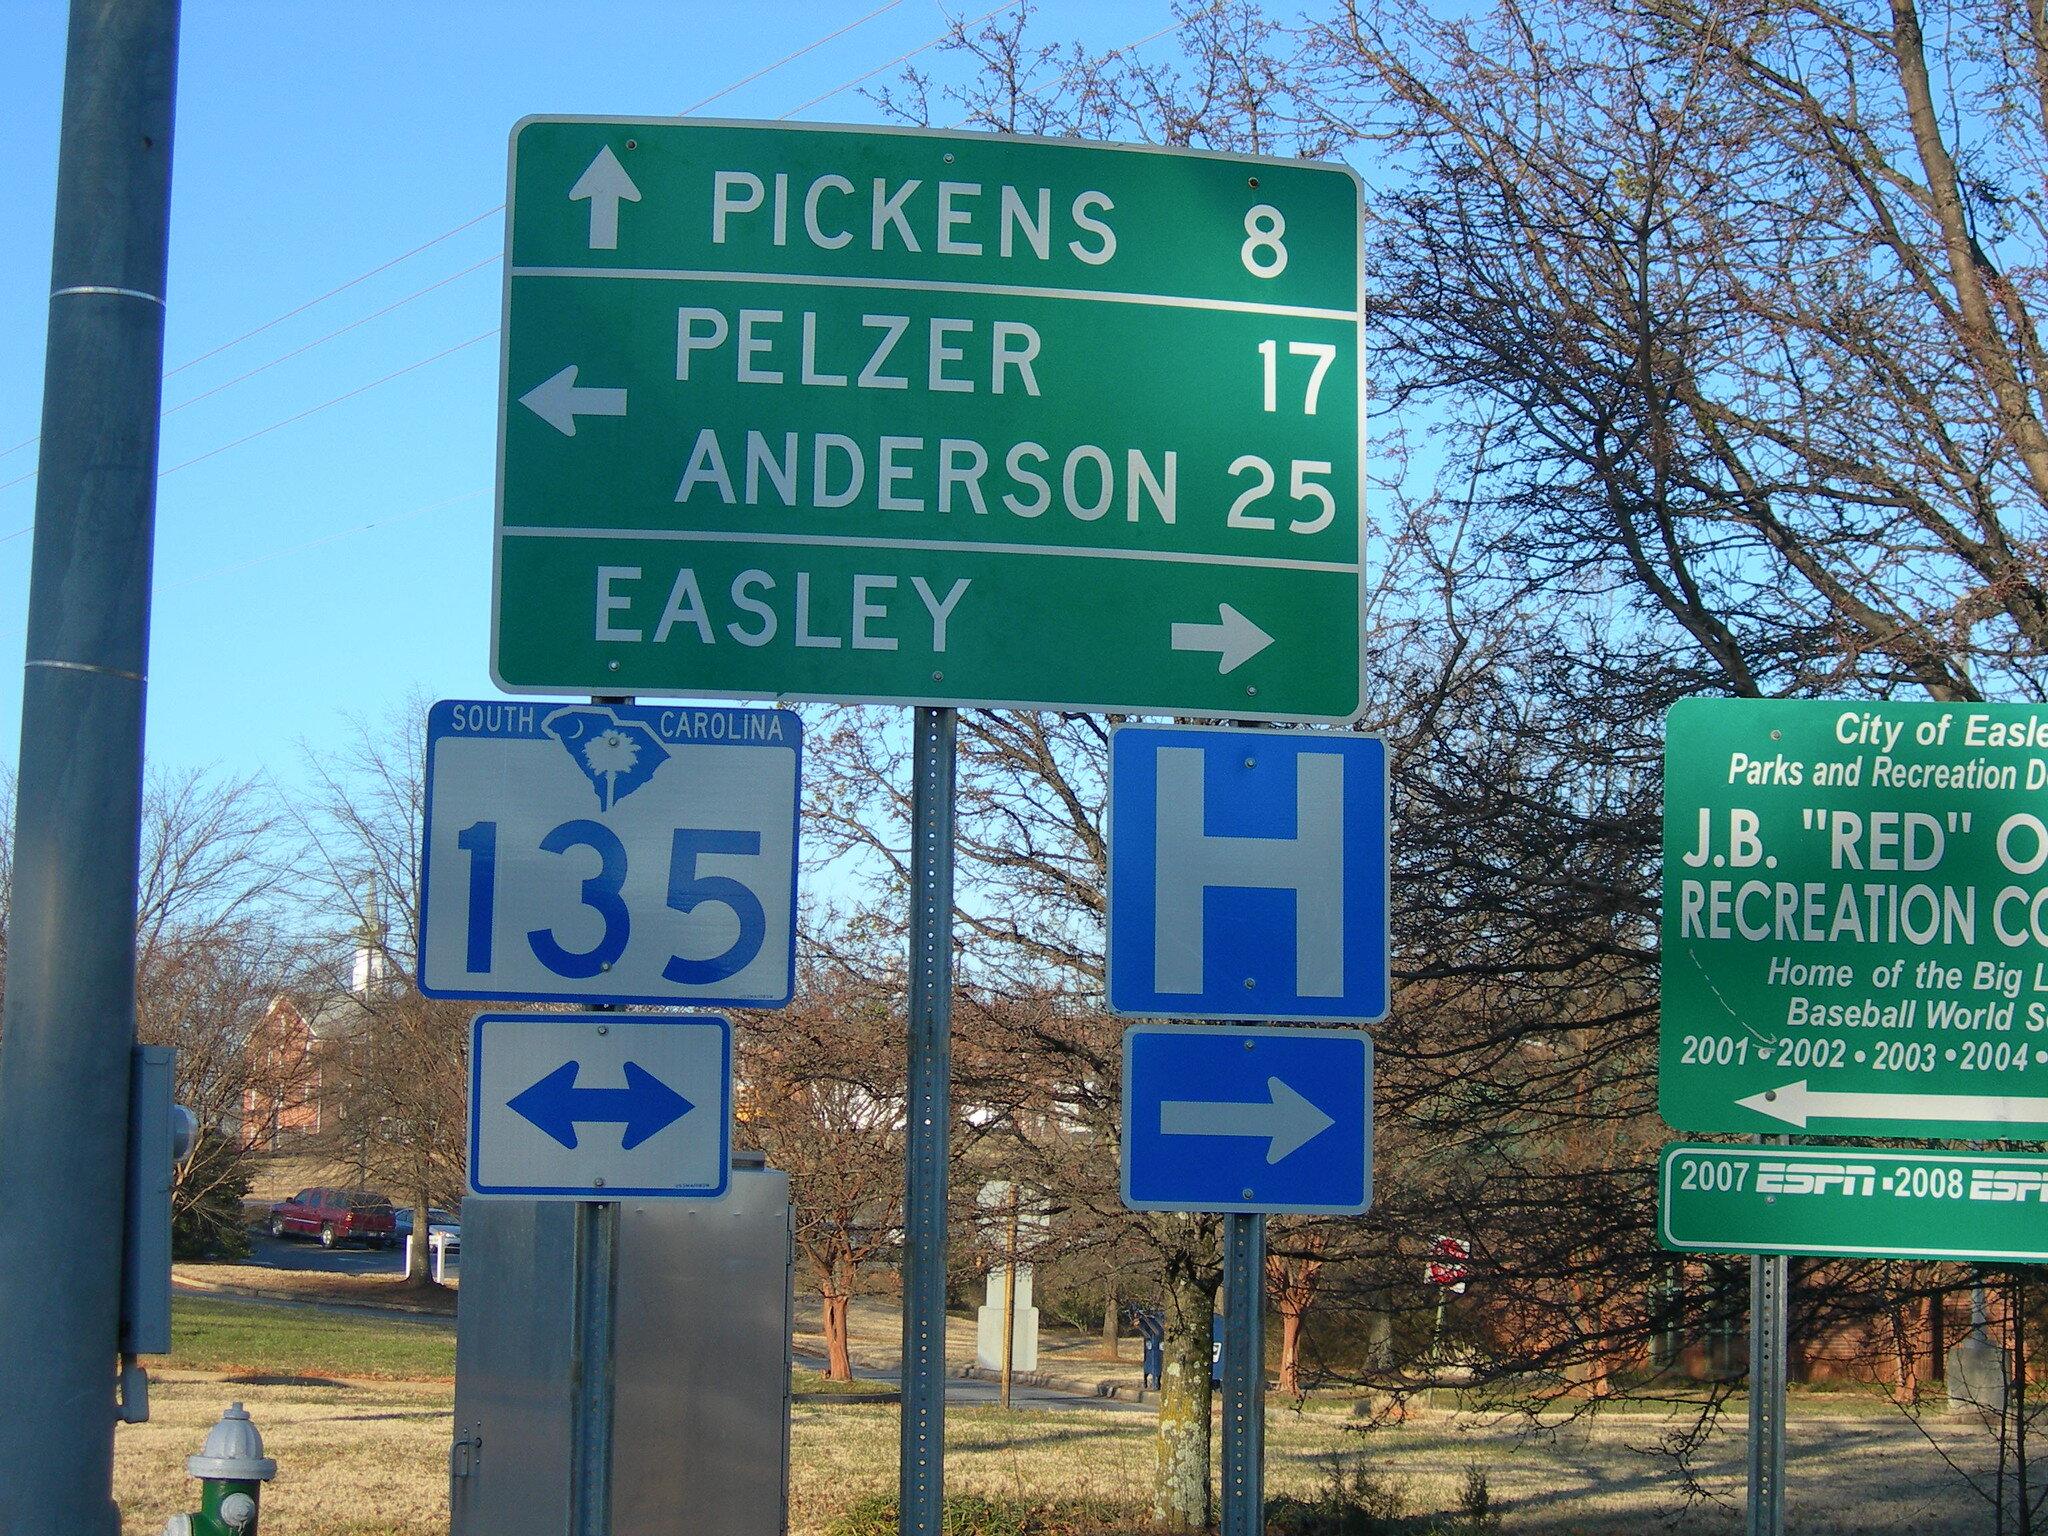 Highway signs in South Carolina. Image via Flickr .